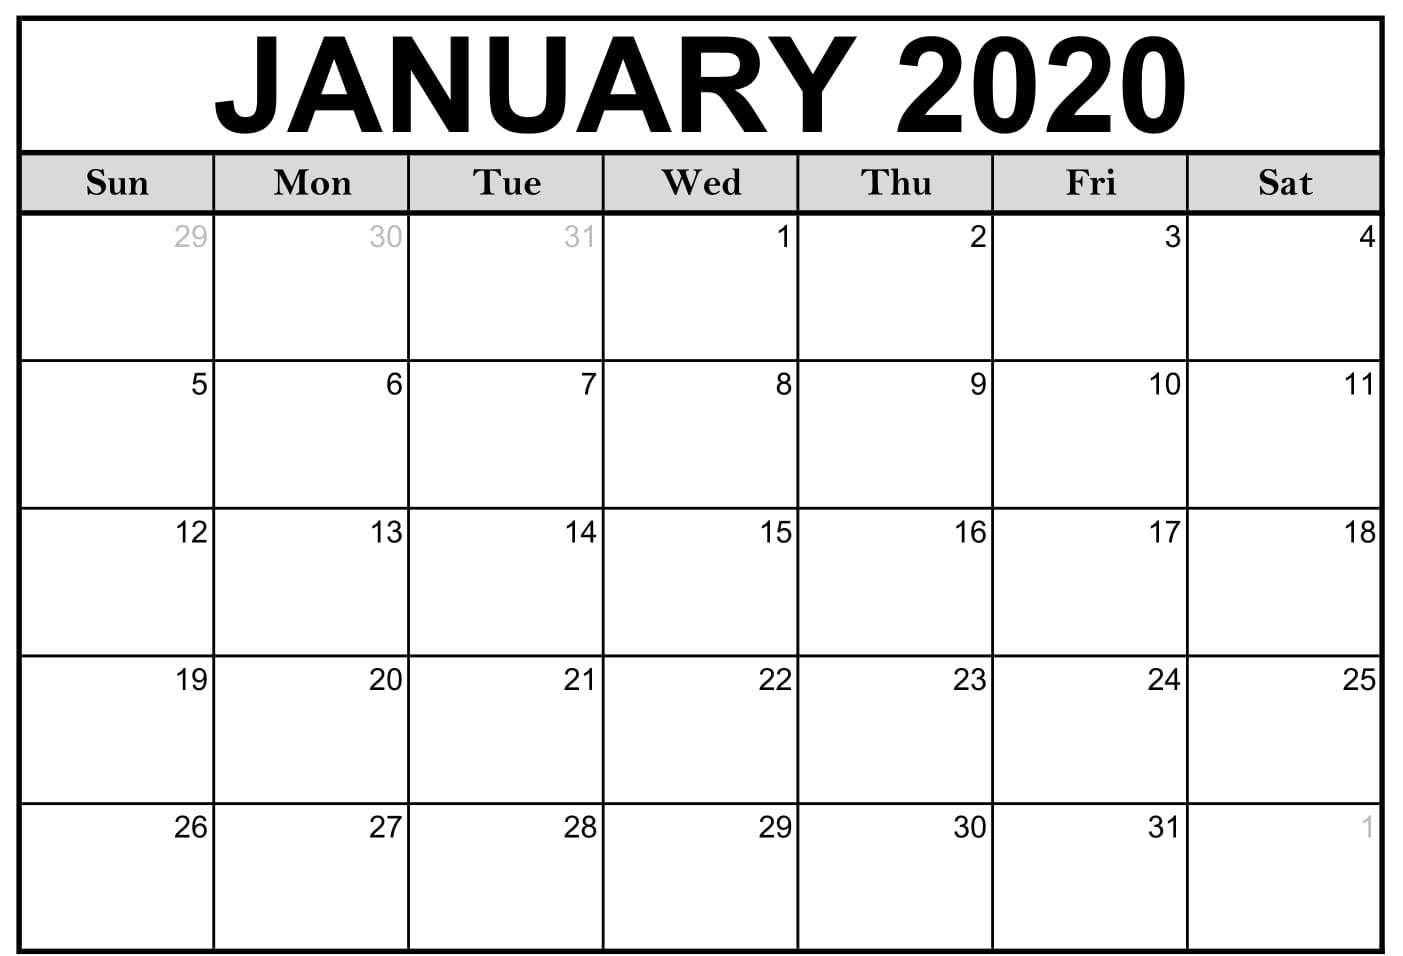 January 2020 Calendar Template   Printable Calendar Template